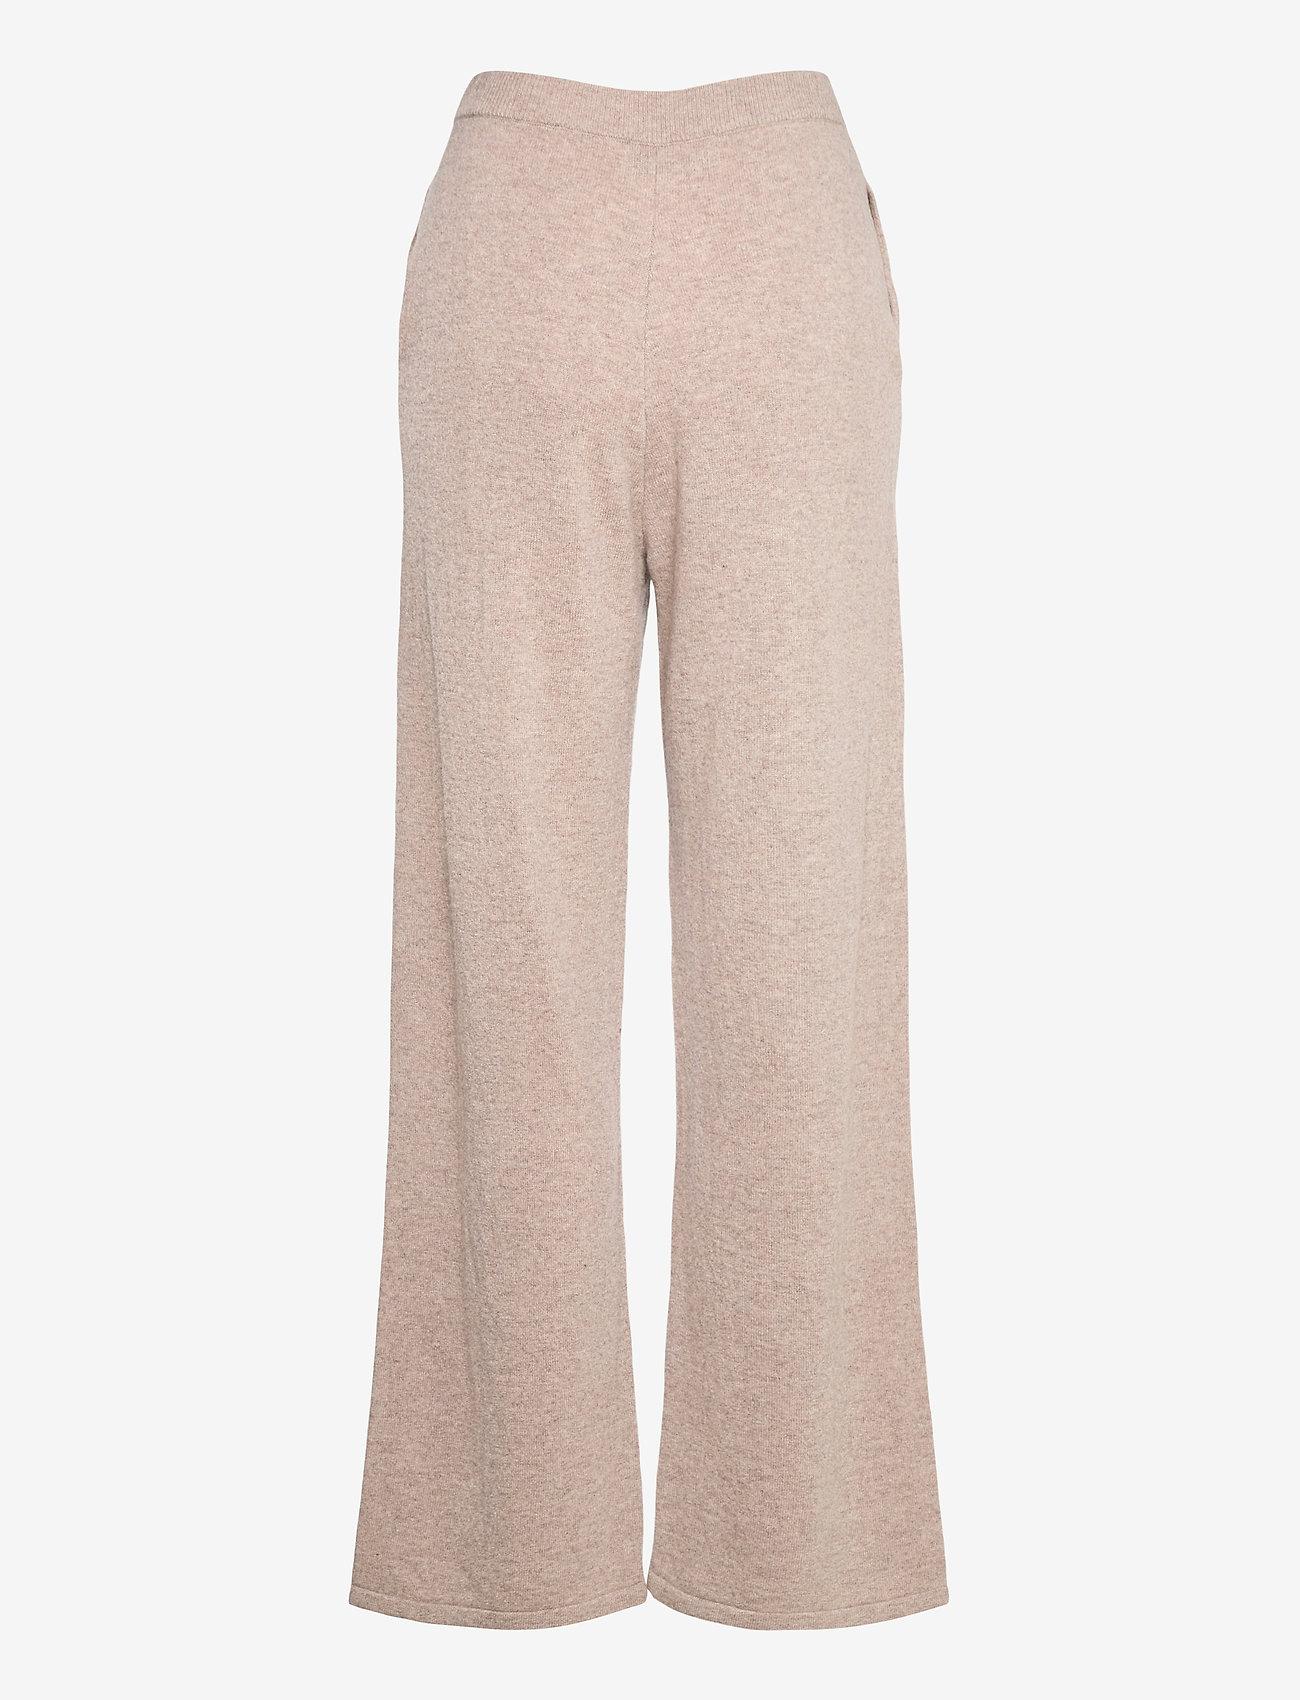 Samsøe Samsøe - Amaris straight trousers 12758 - bukser med brede ben - khaki mel. - 1